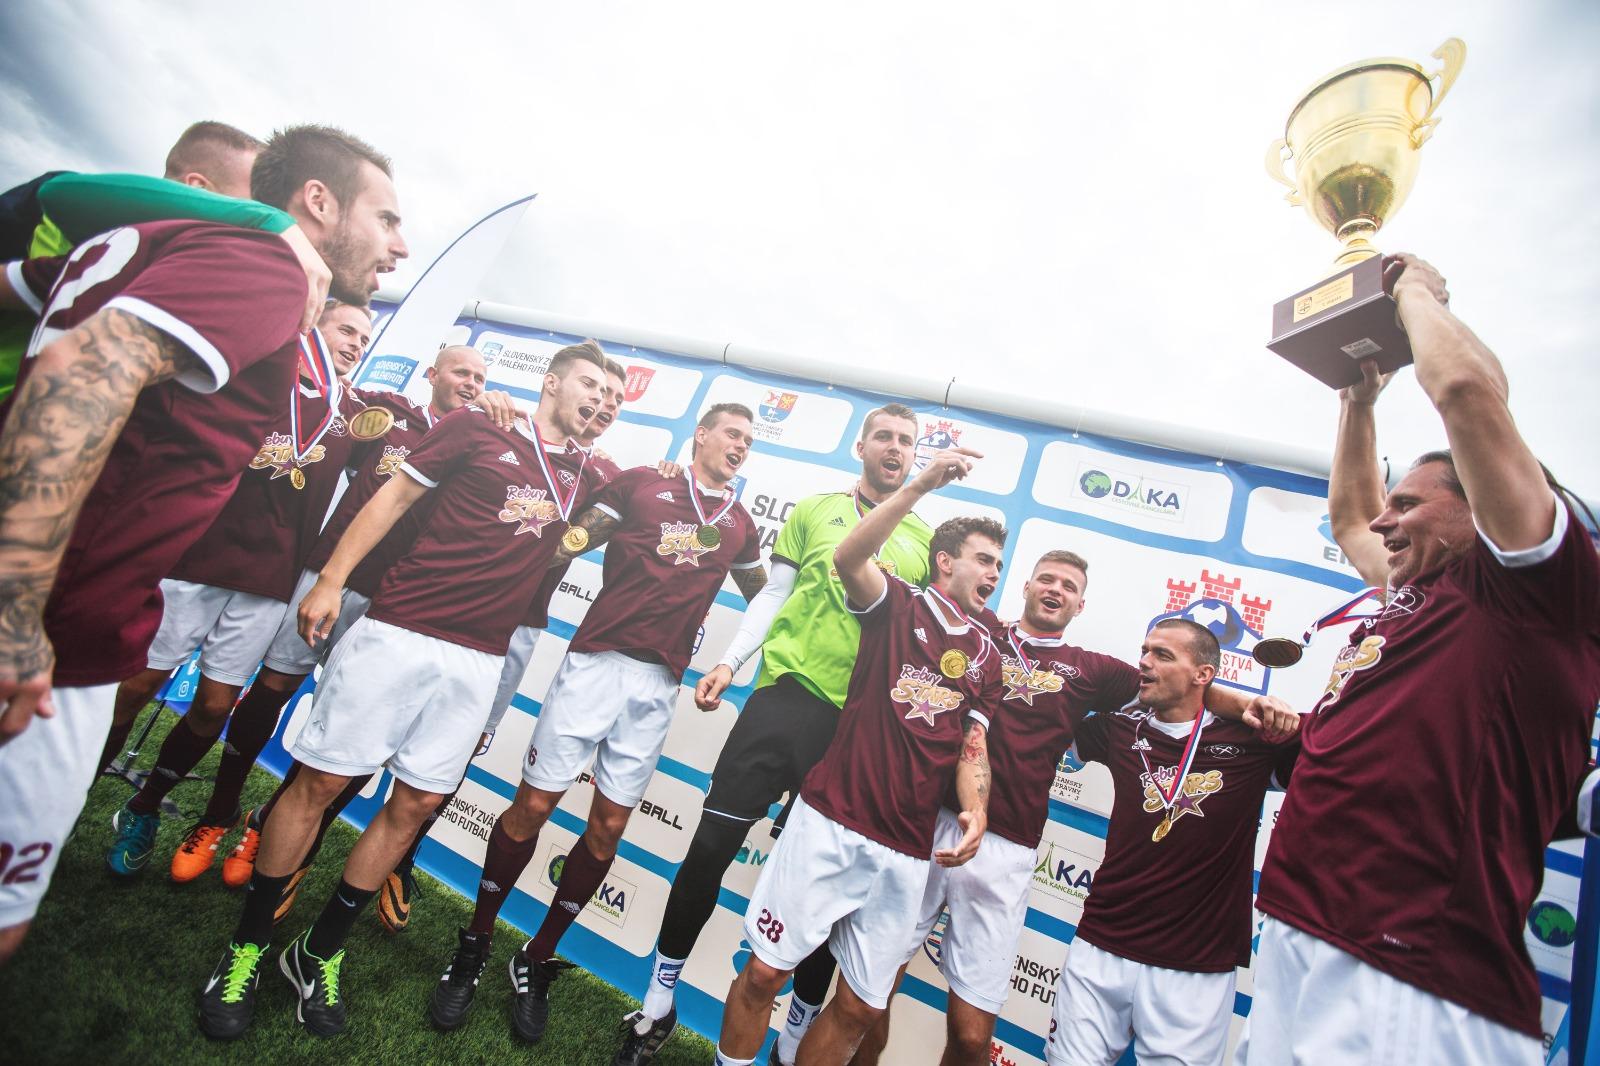 FOTO: malyfutbal.sk